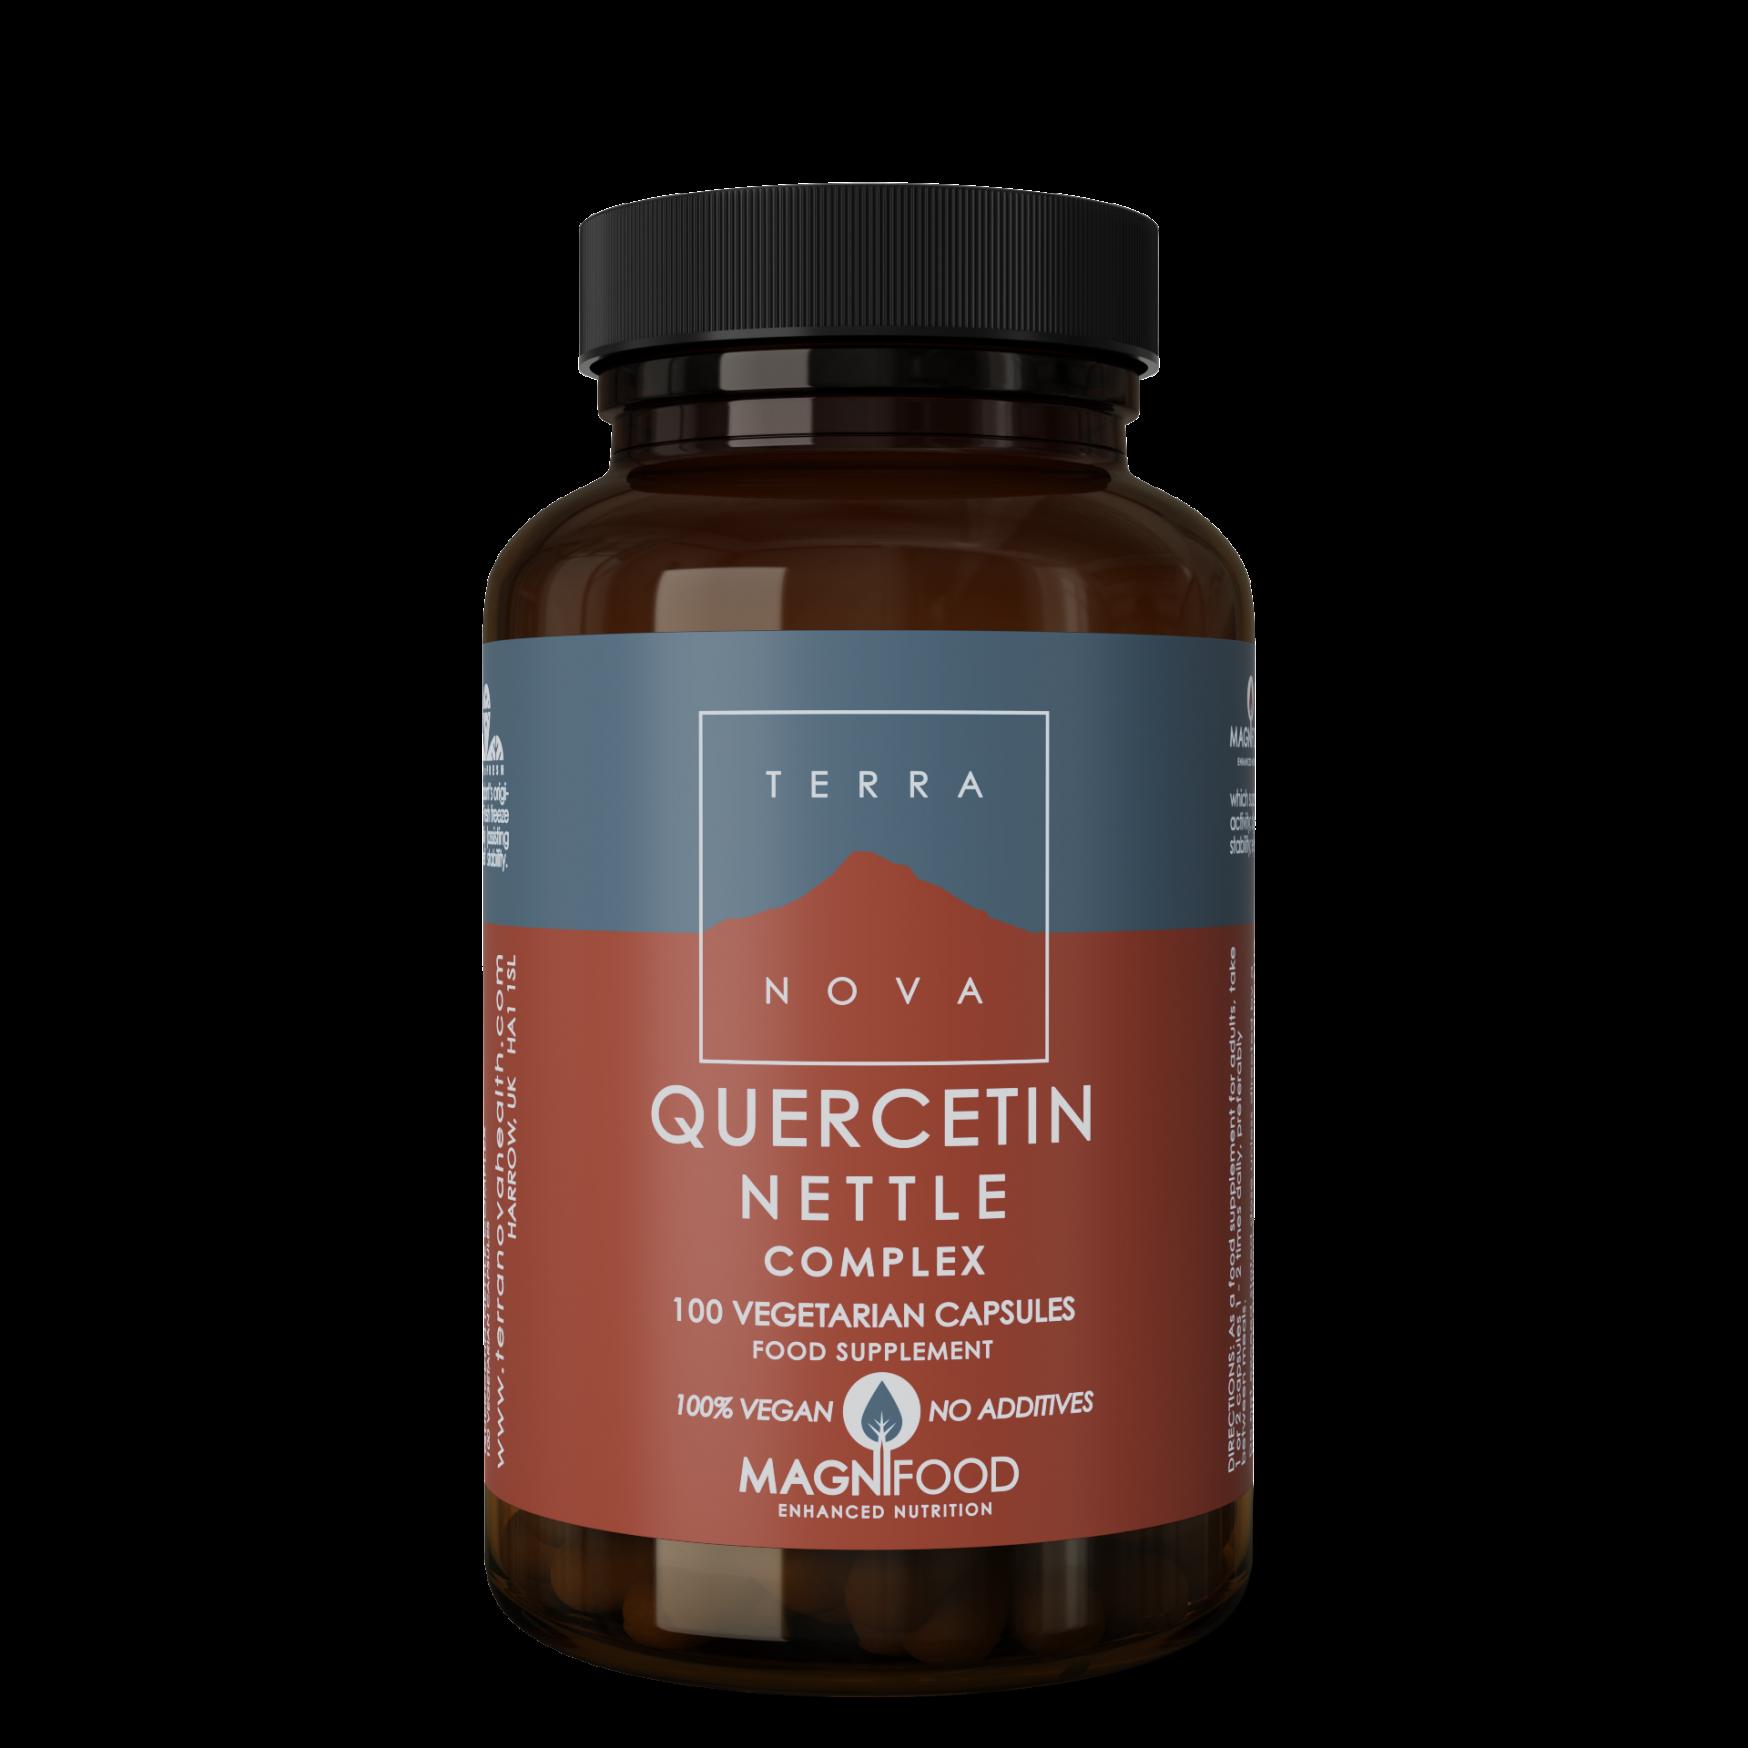 Quercetin Nettle Complex 100's